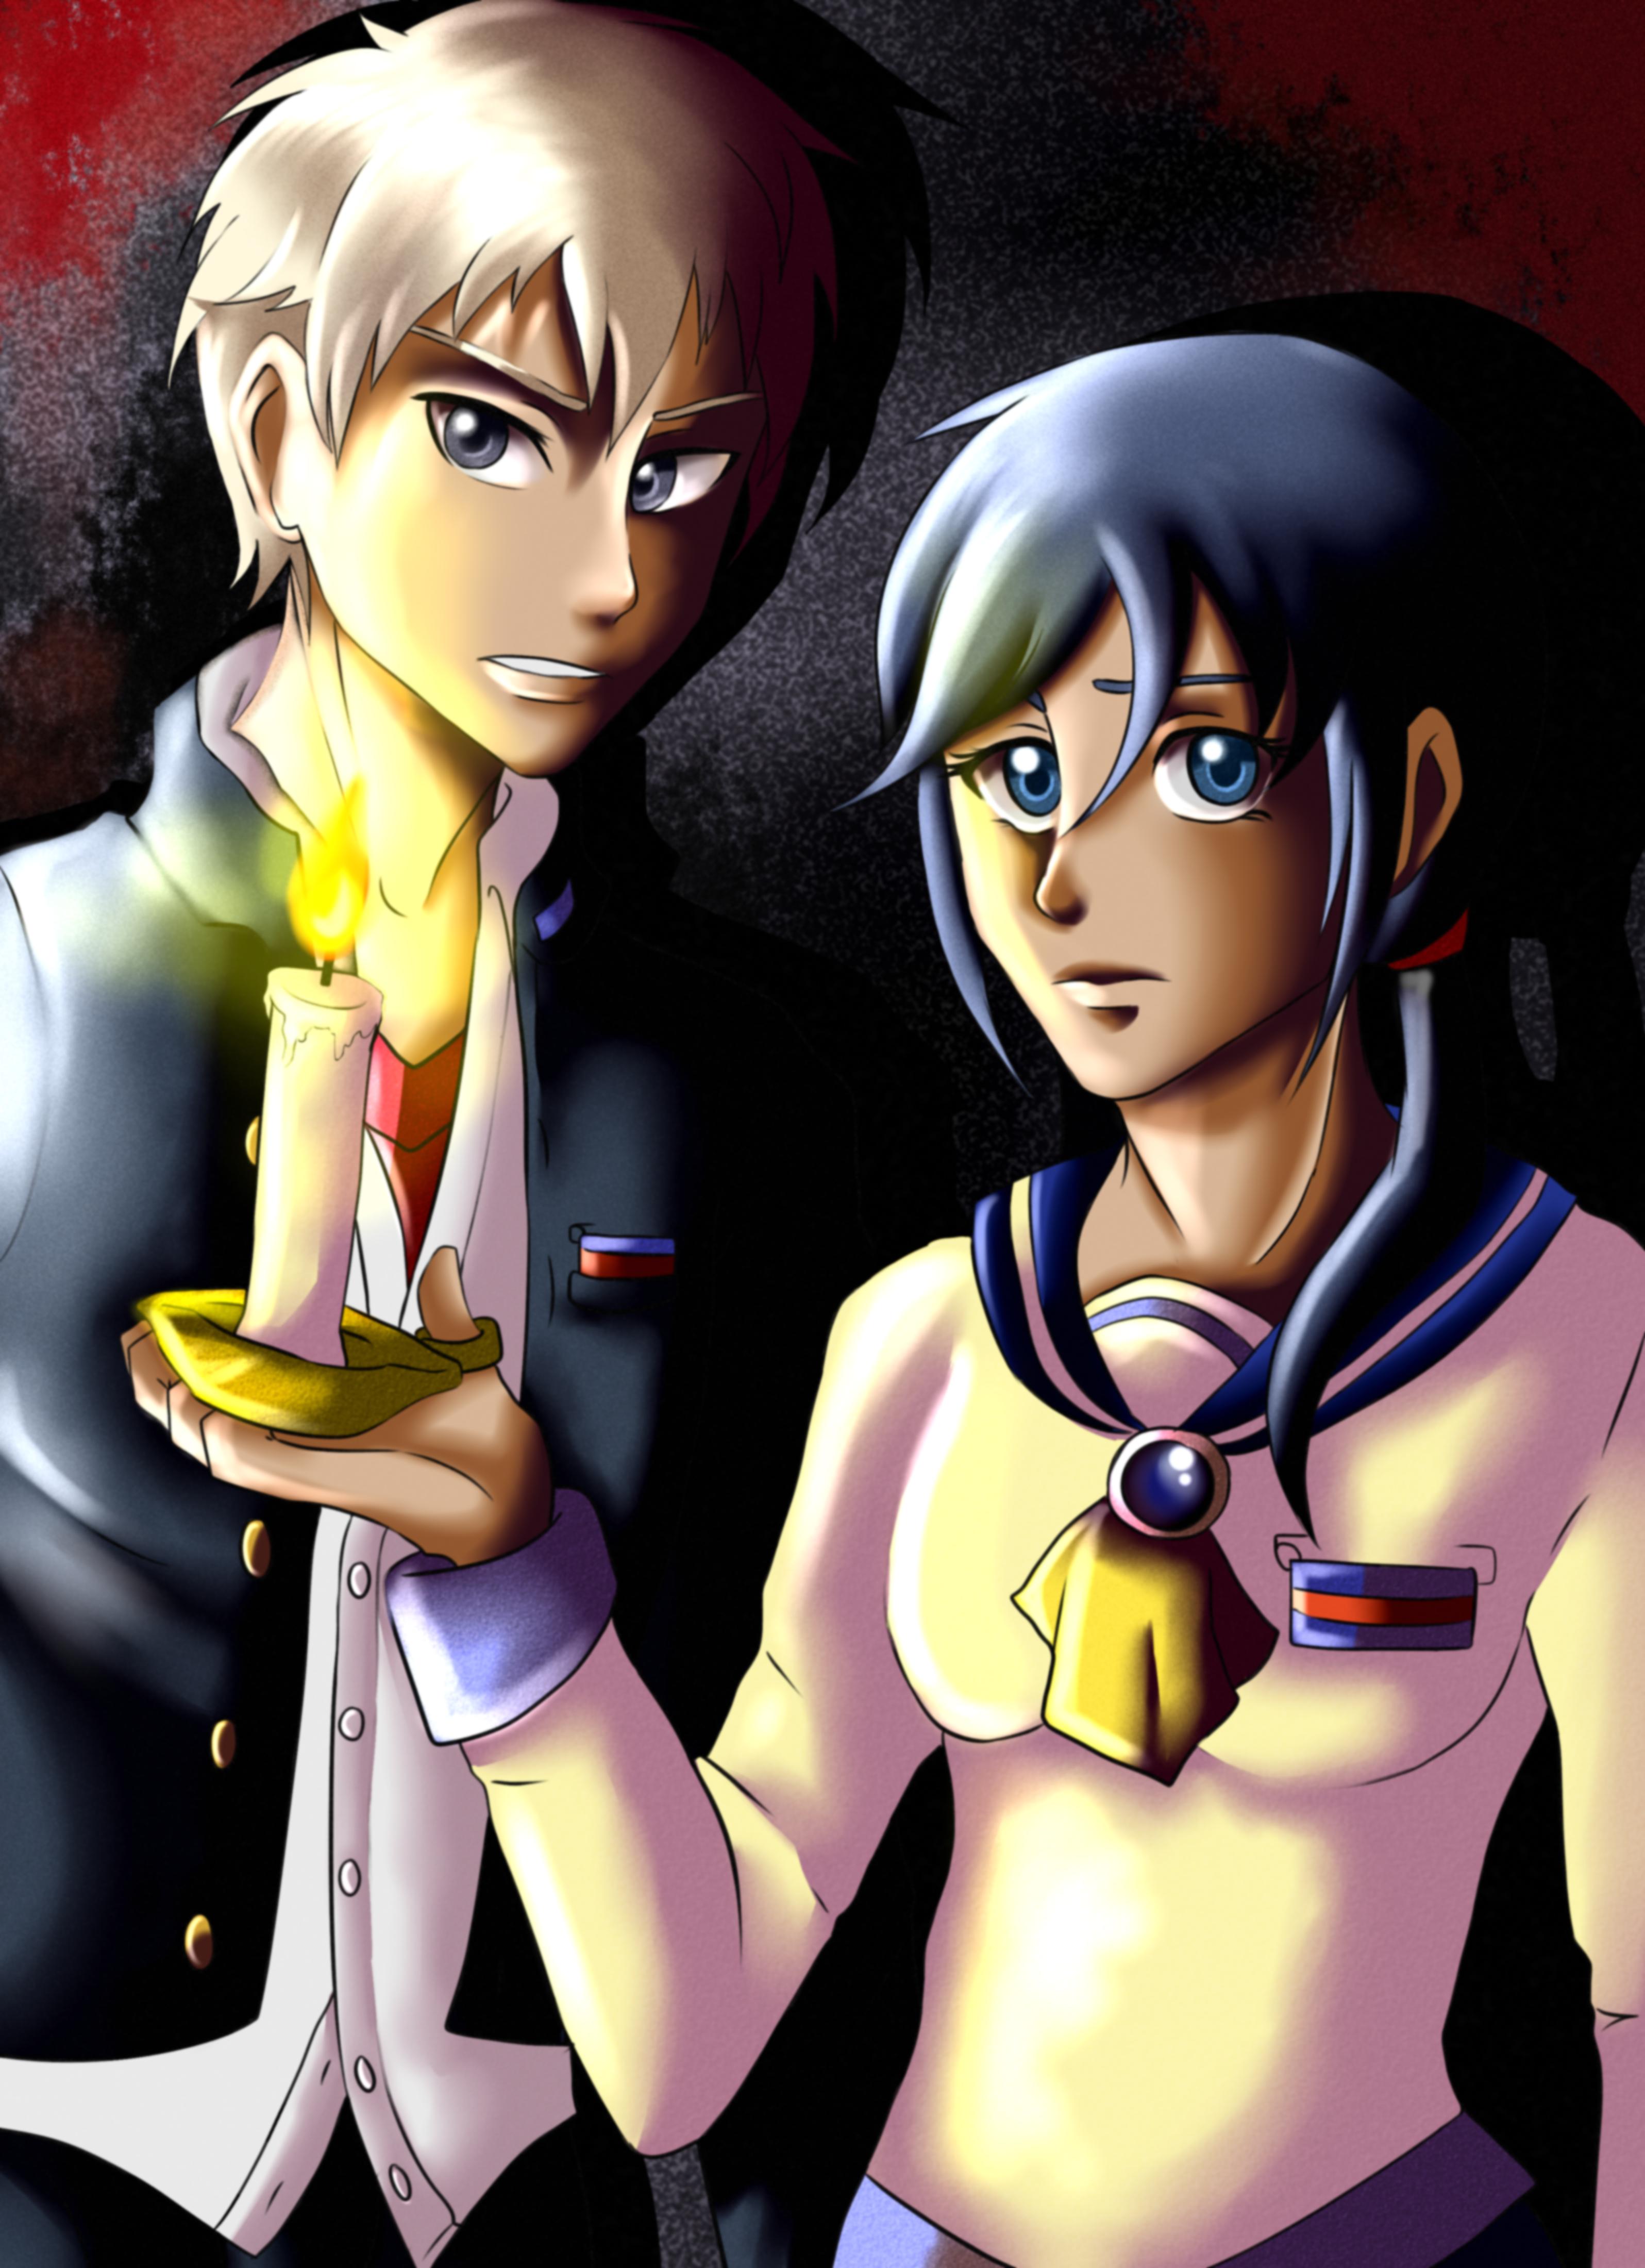 Corpse party ayumi and yoshiki by x1yummy1x on deviantart